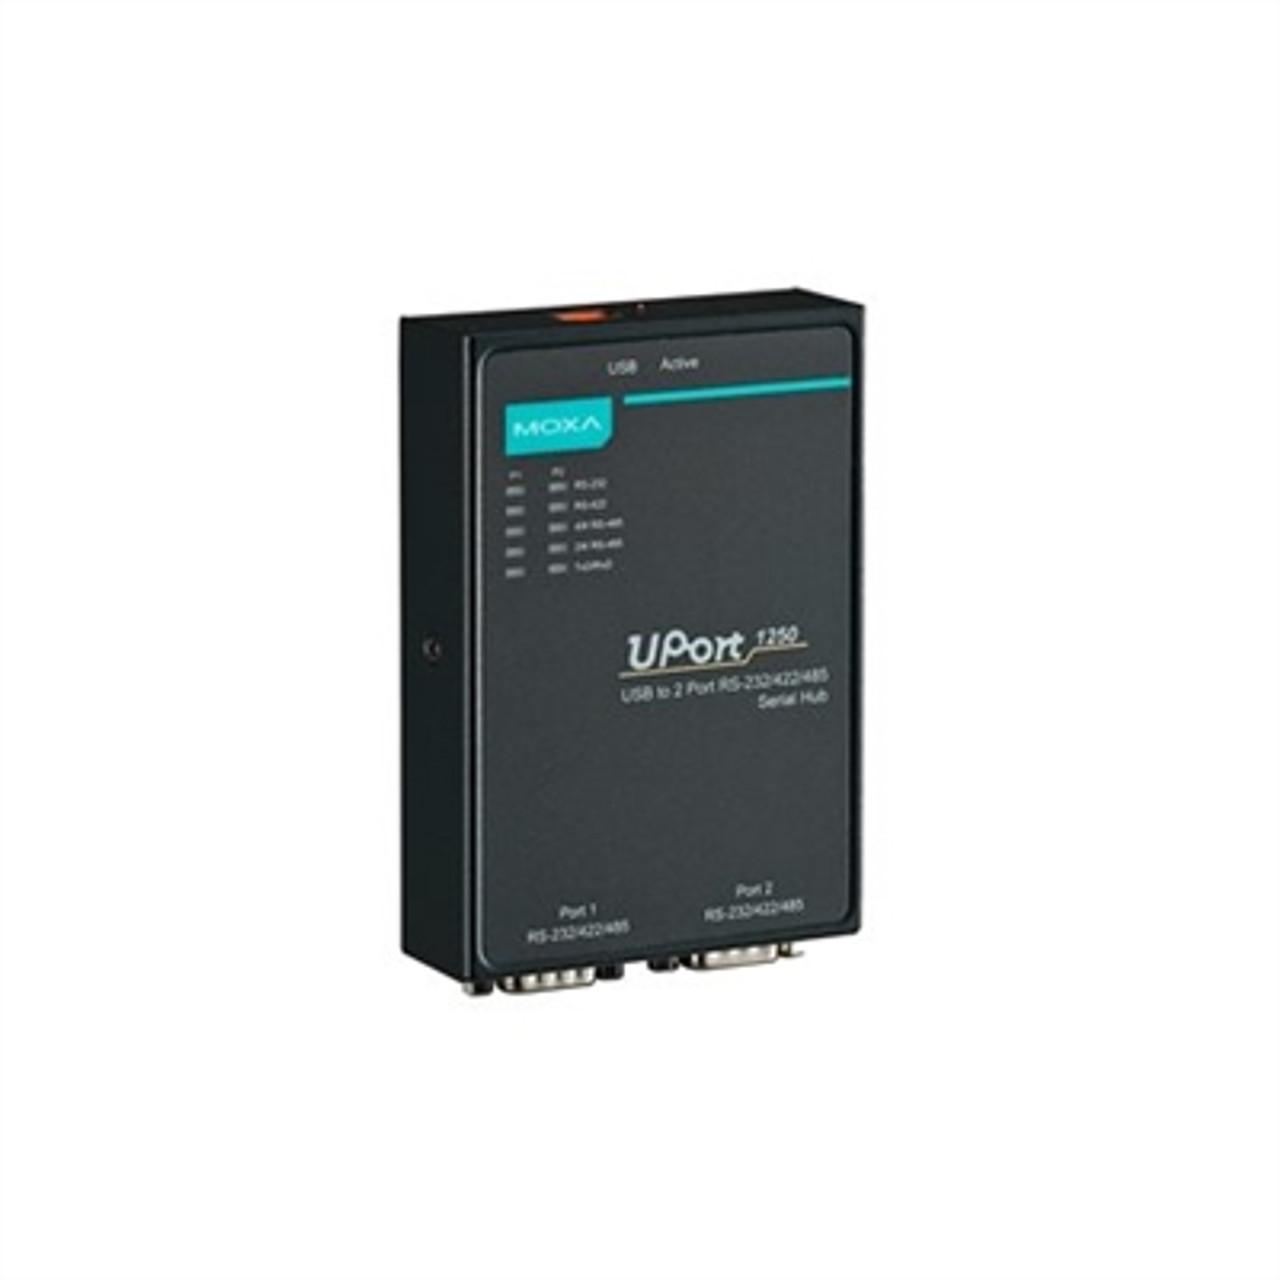 Moxa UPort 1250 USB to 2-port serial hub